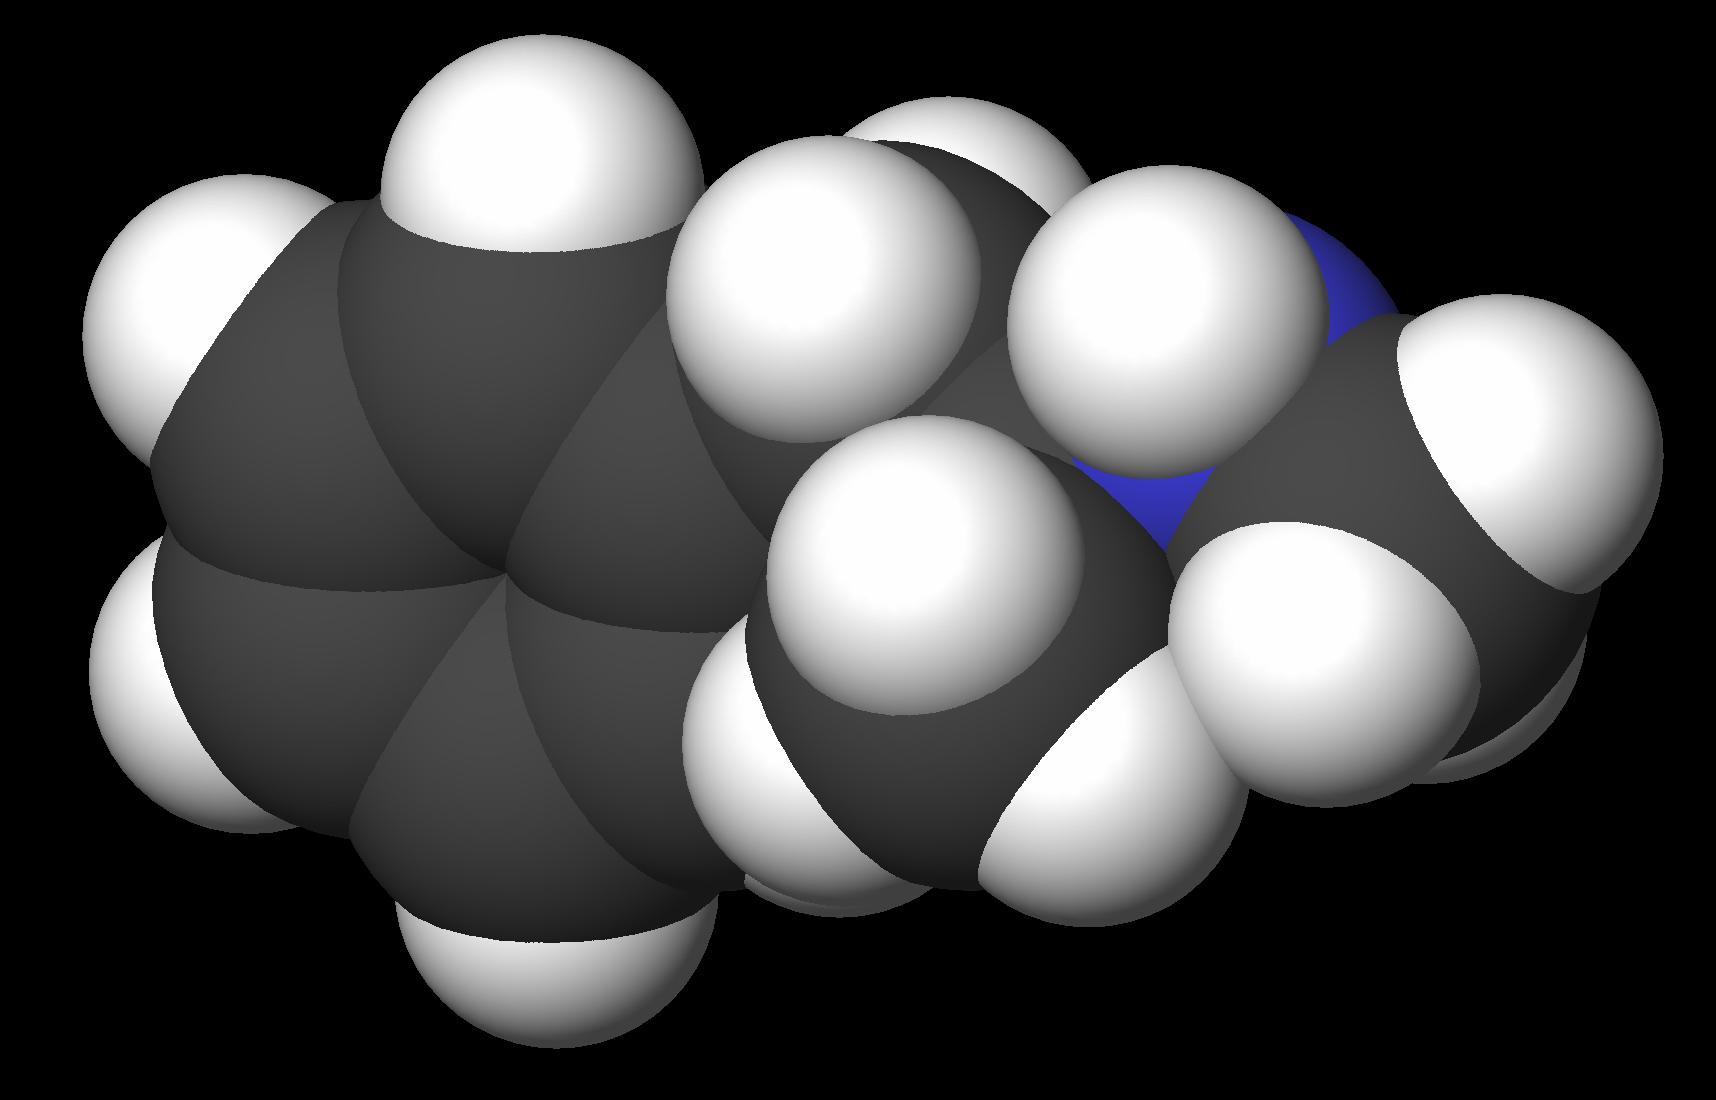 speed methylamphetamine essay